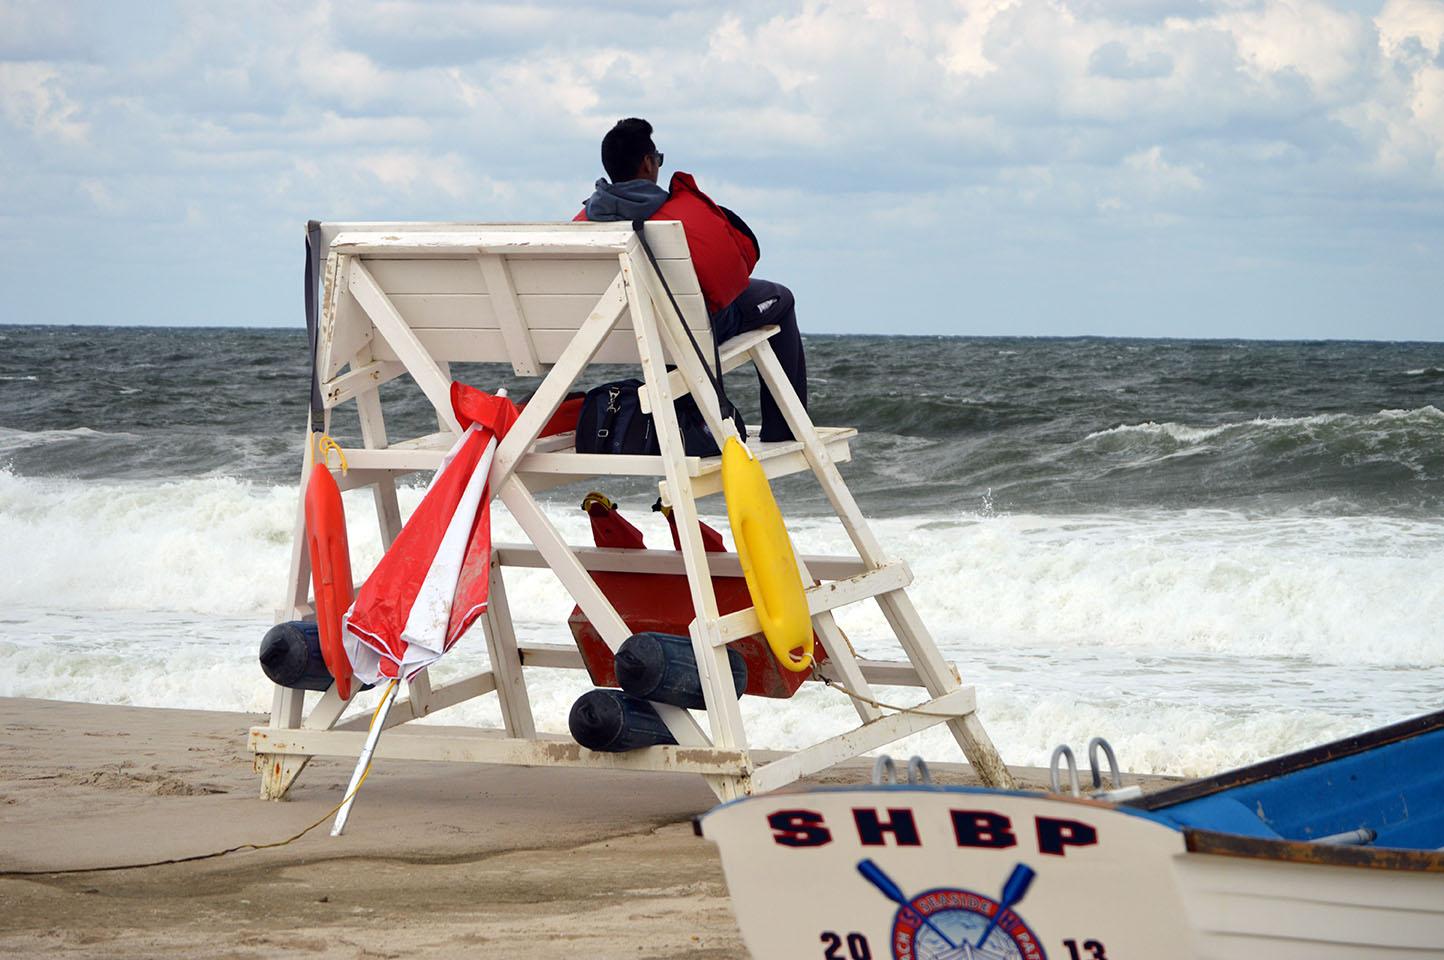 Rough surf closes beaches in Seaside Heights, N.J., Aug. 28, 2017. (Photo: Daniel Nee)